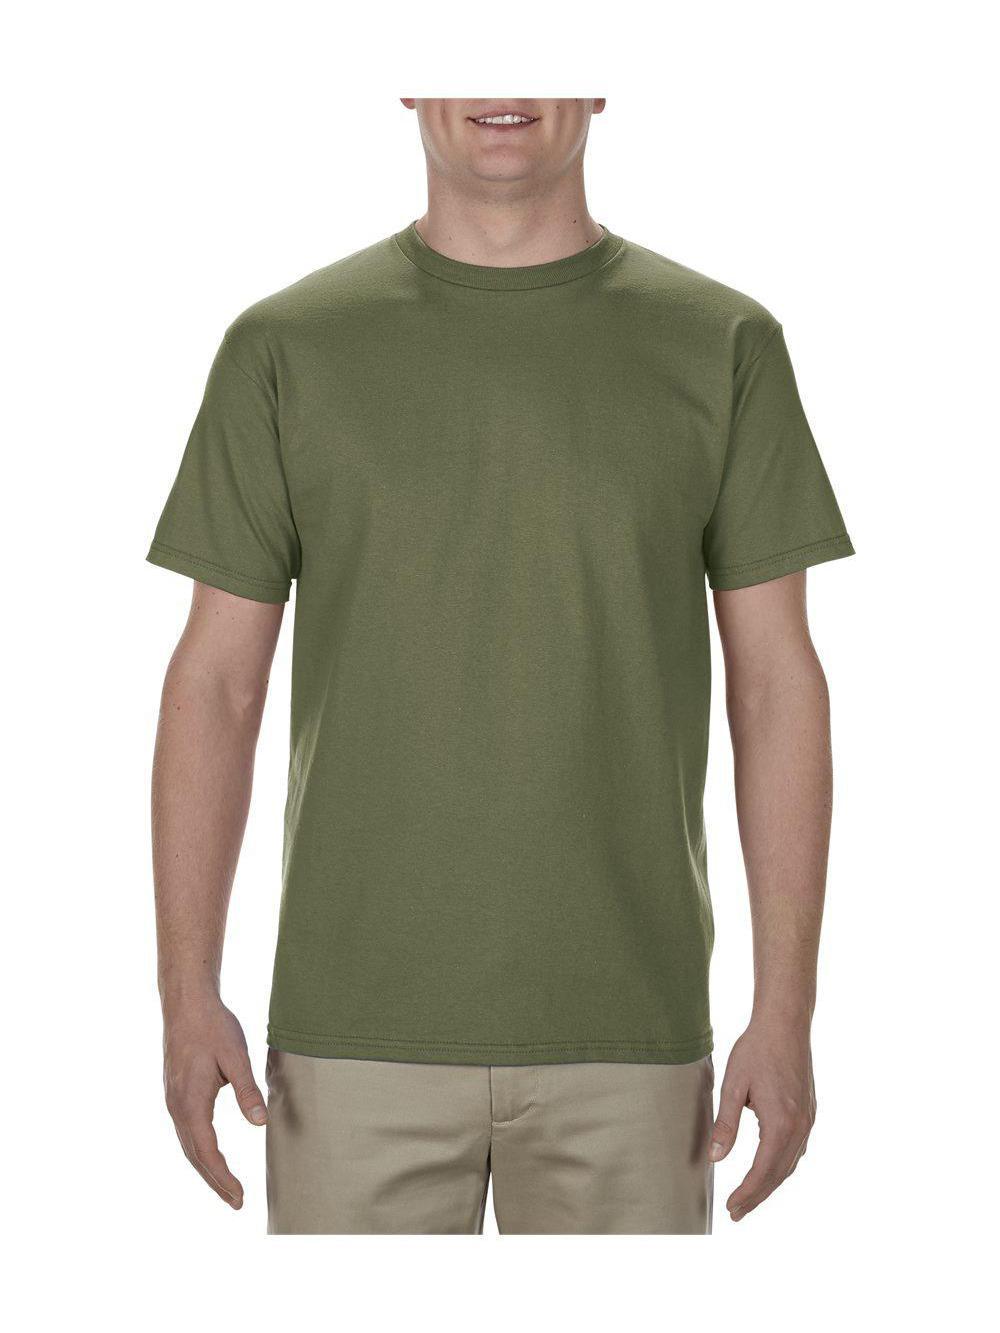 ALSTYLE-Premium-T-Shirt-1701 thumbnail 33